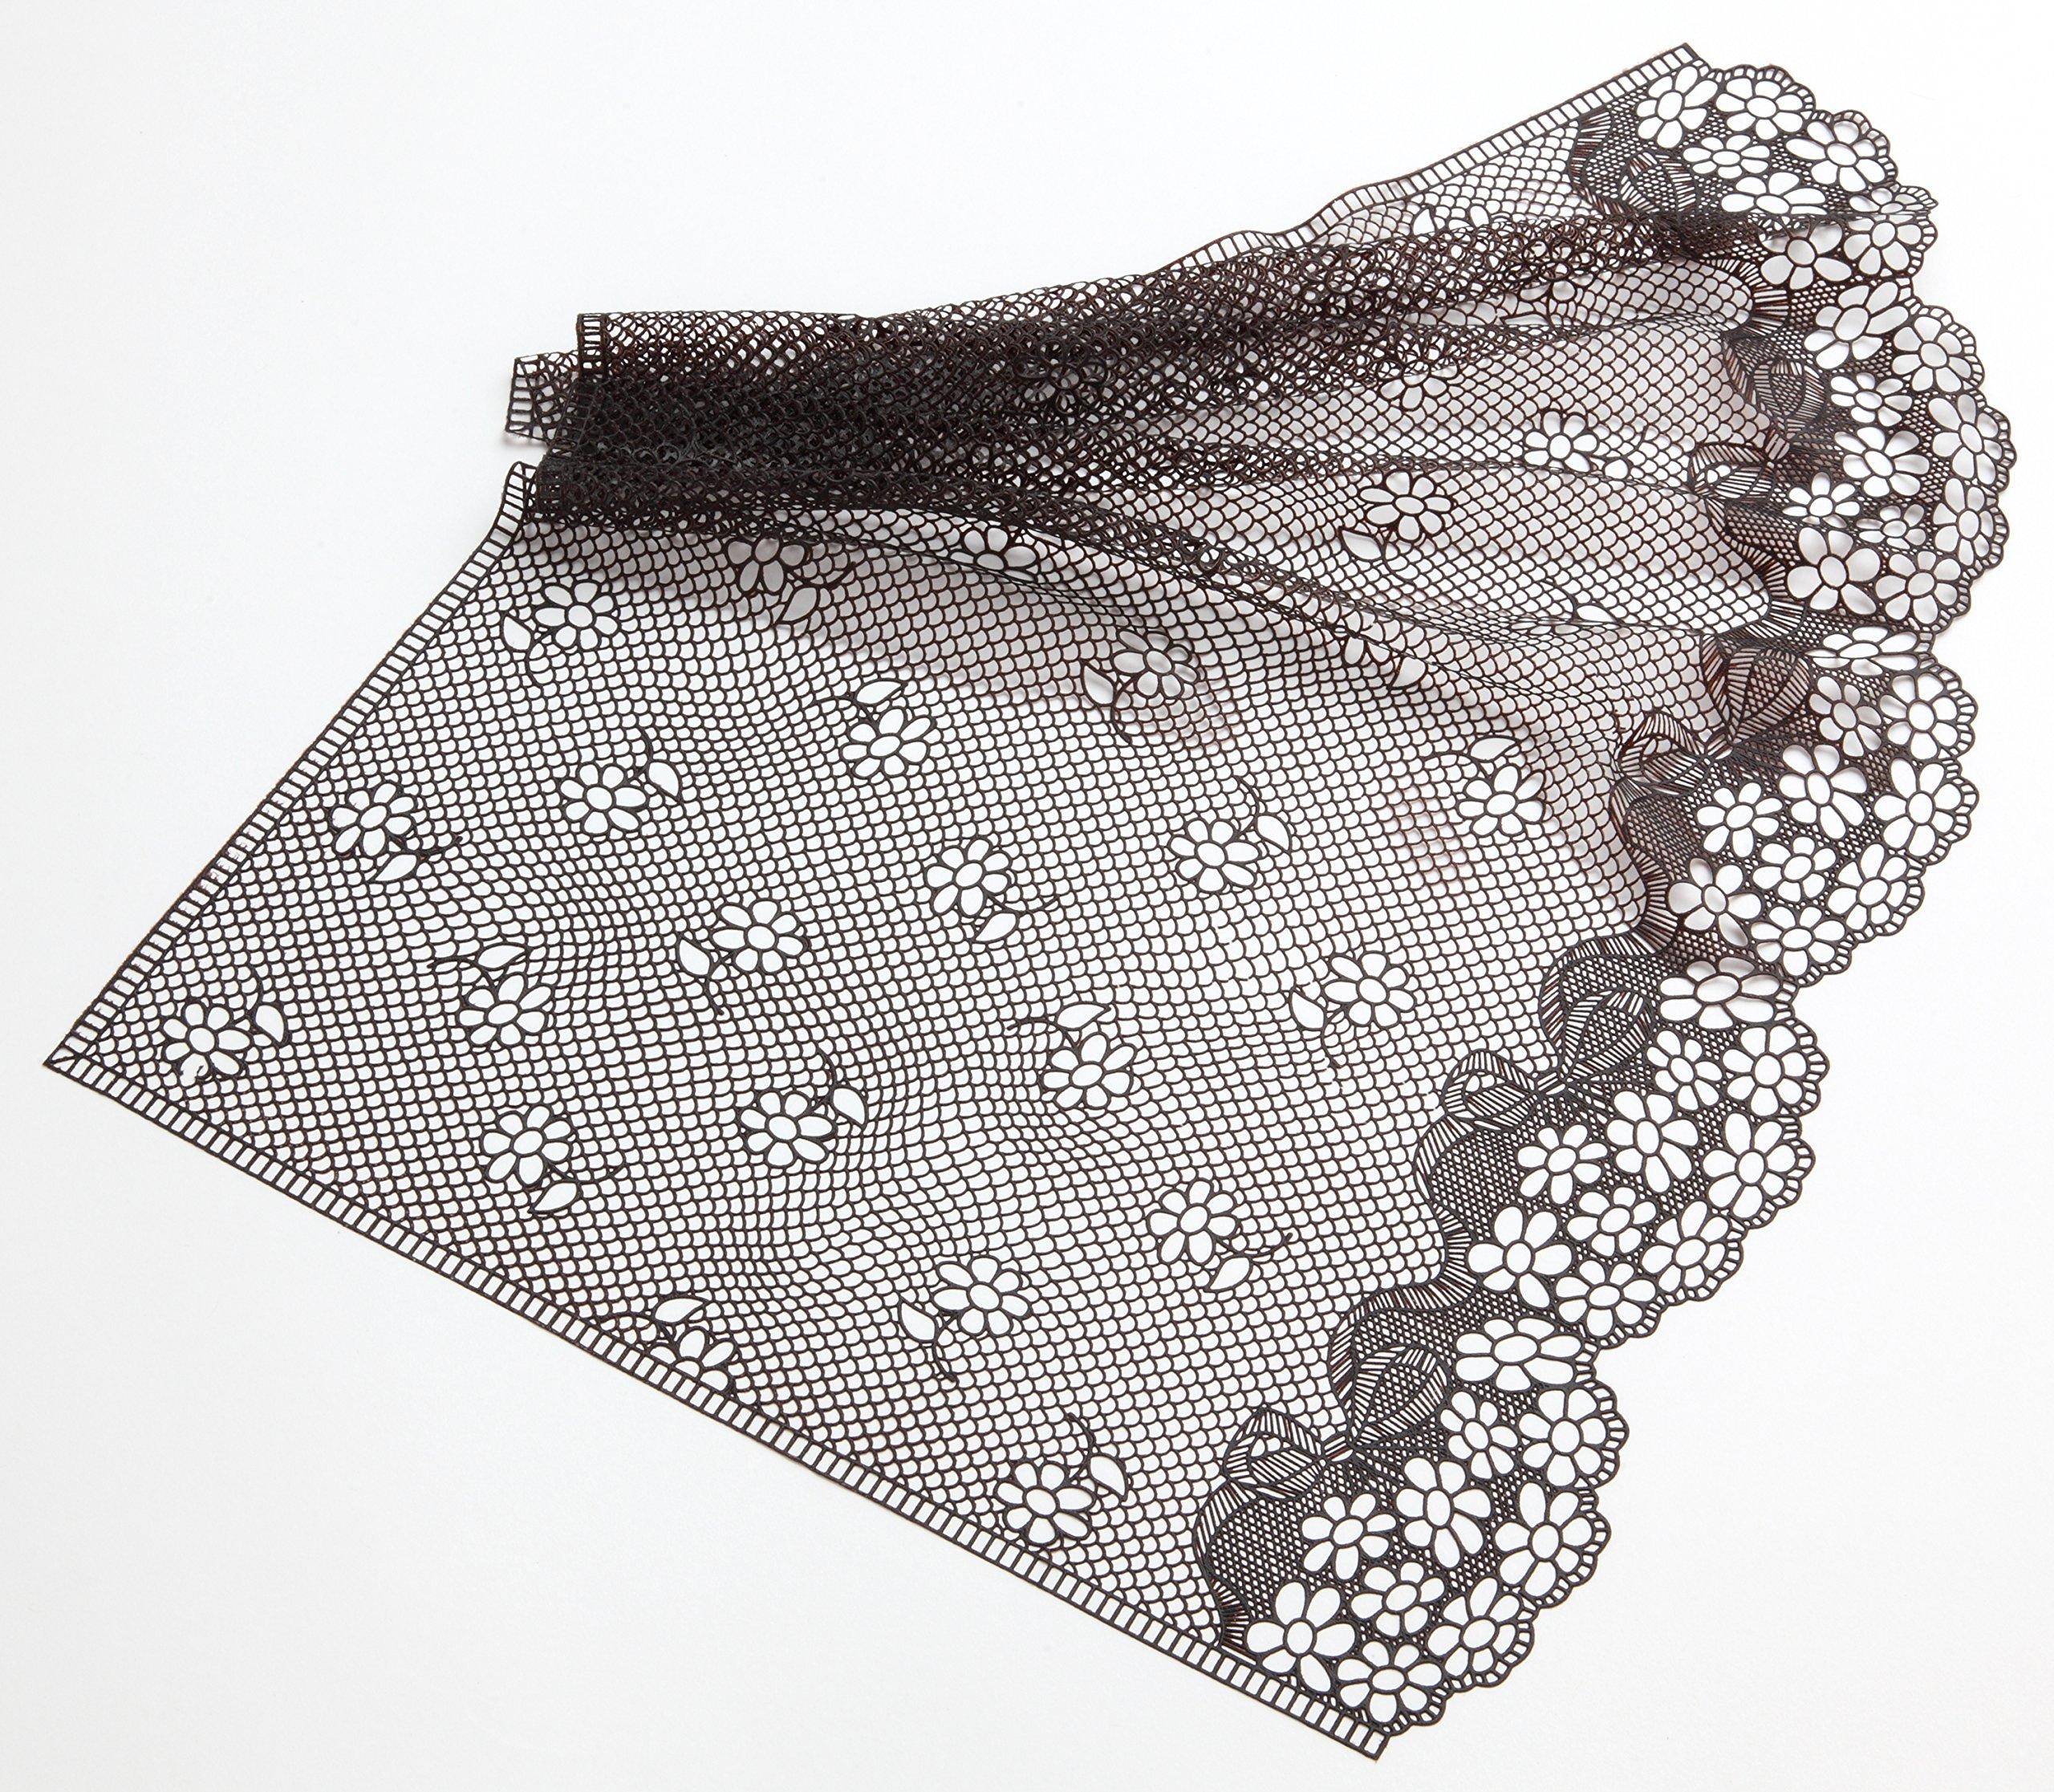 SugarVeil Flower Net Mat - Extra Large by SugarVeil (Image #5)